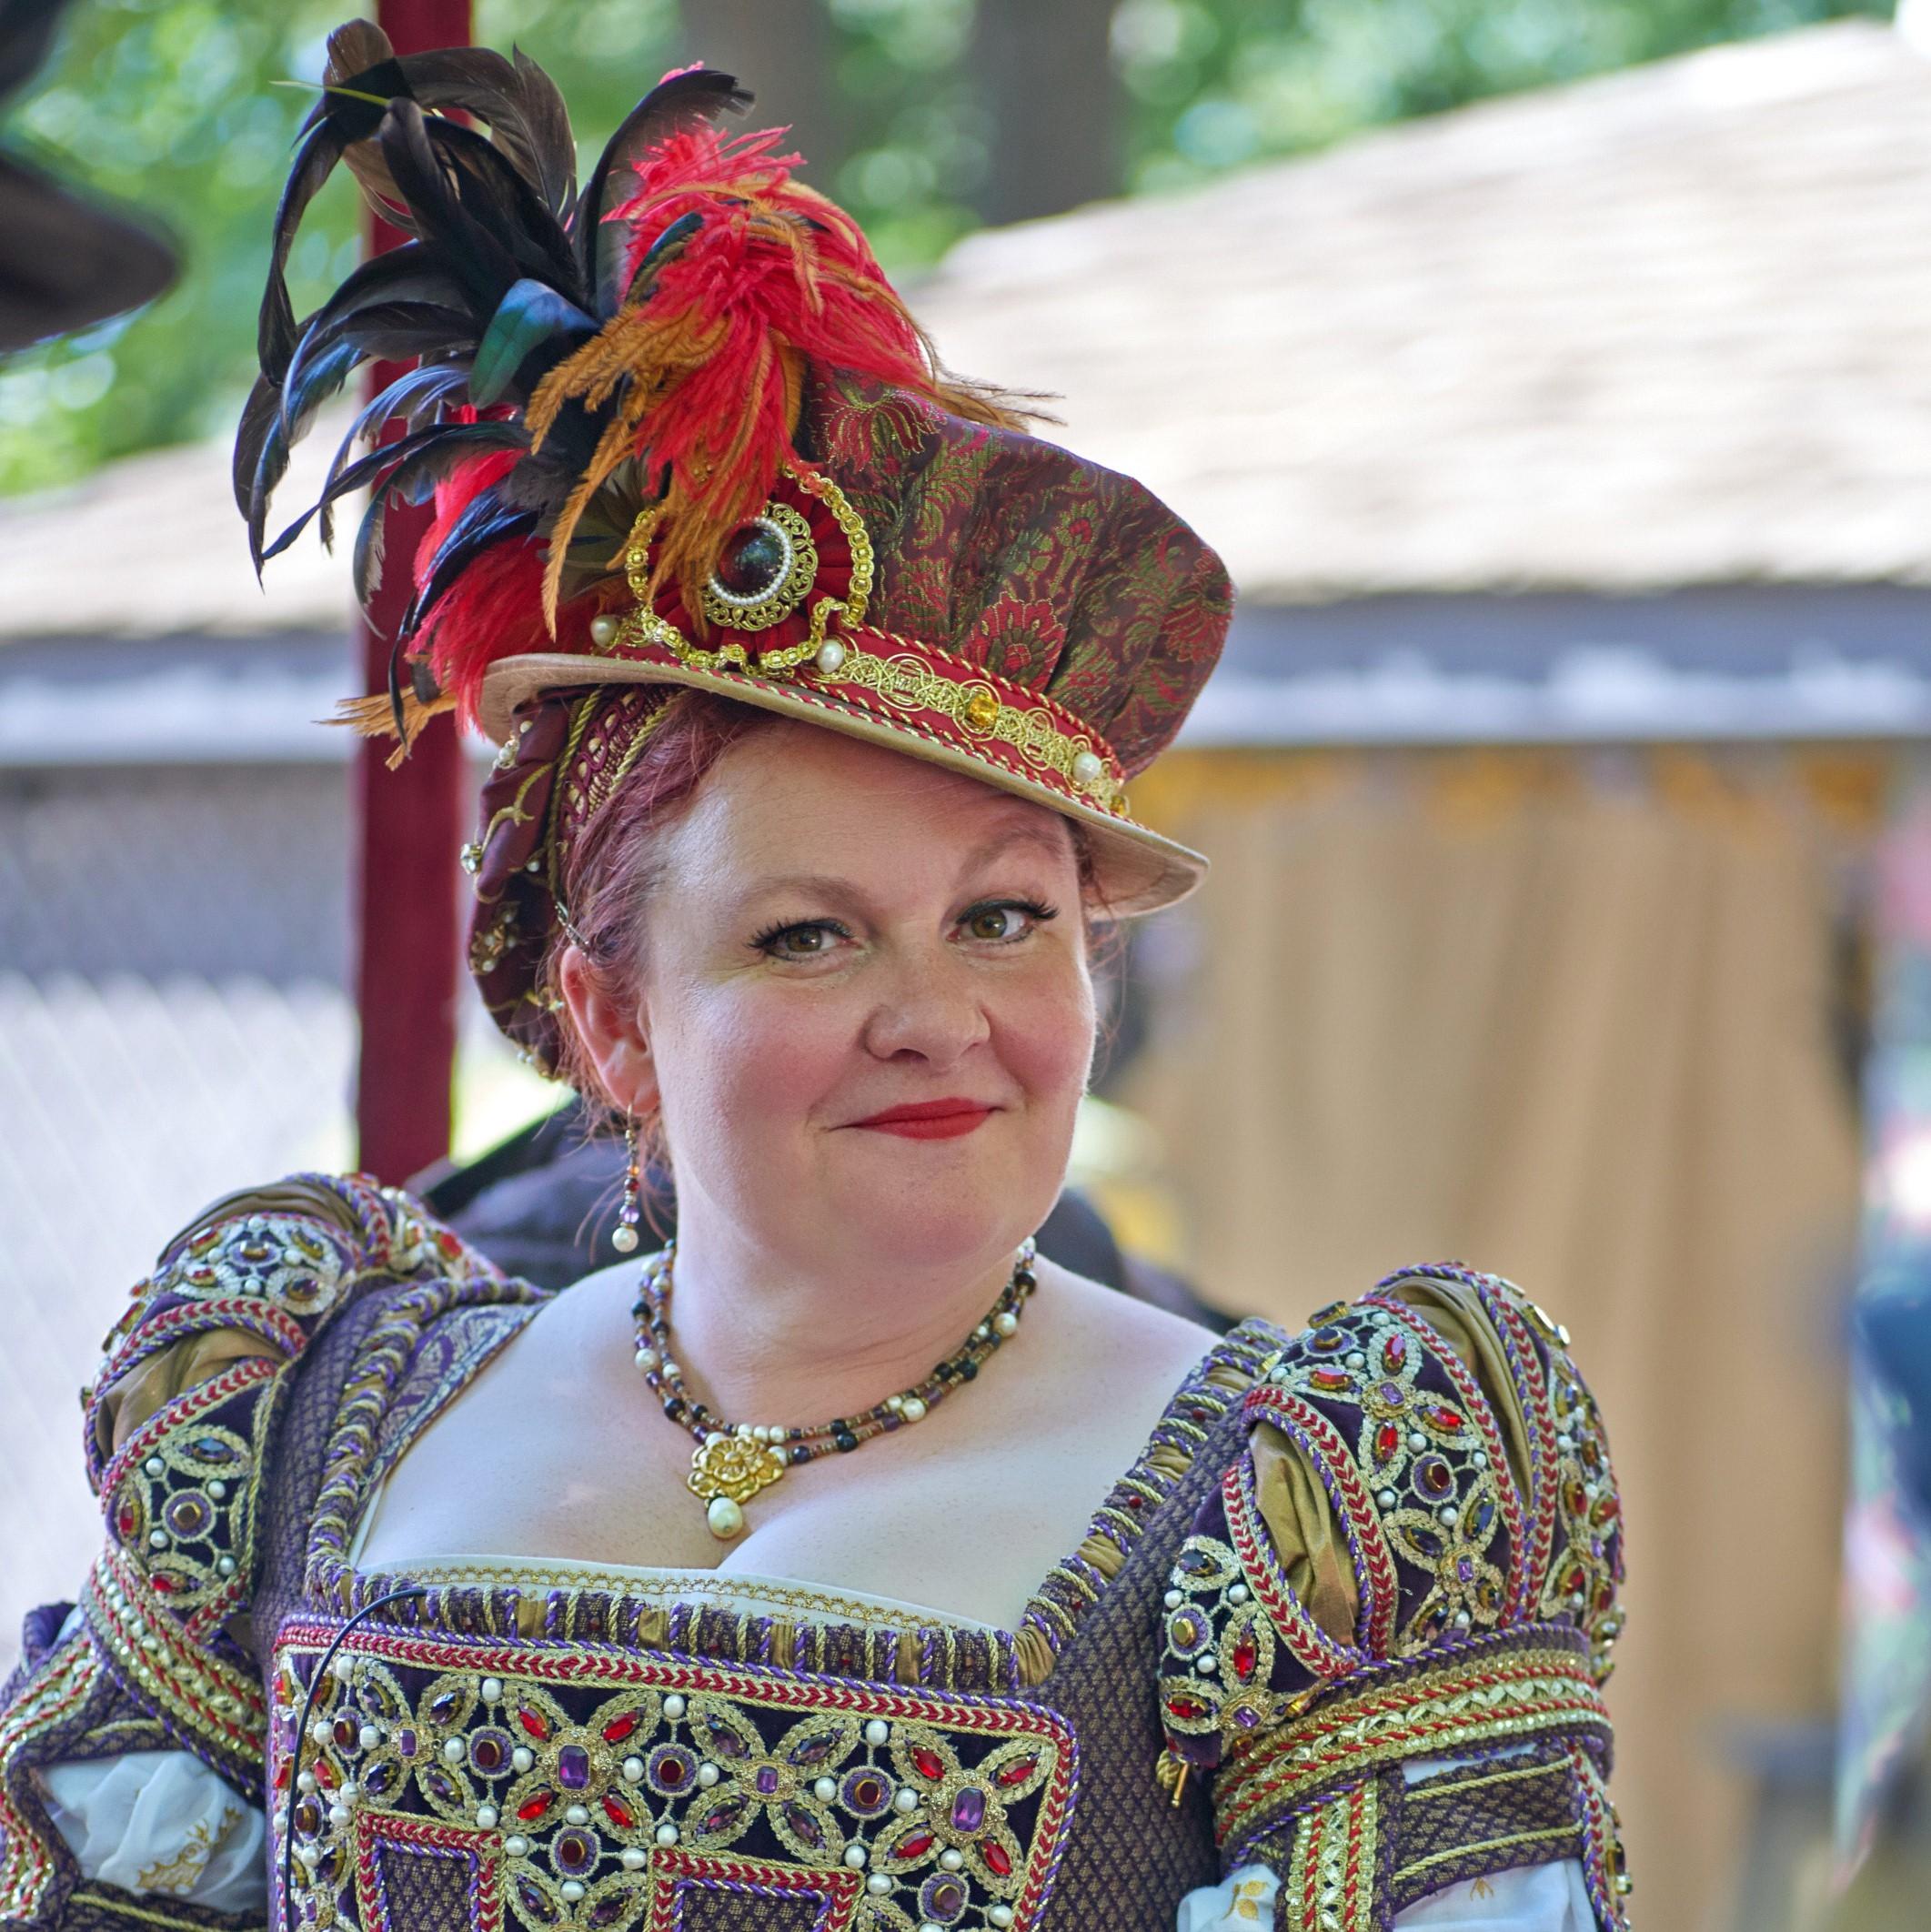 Entertainment: Queen Elizabeth